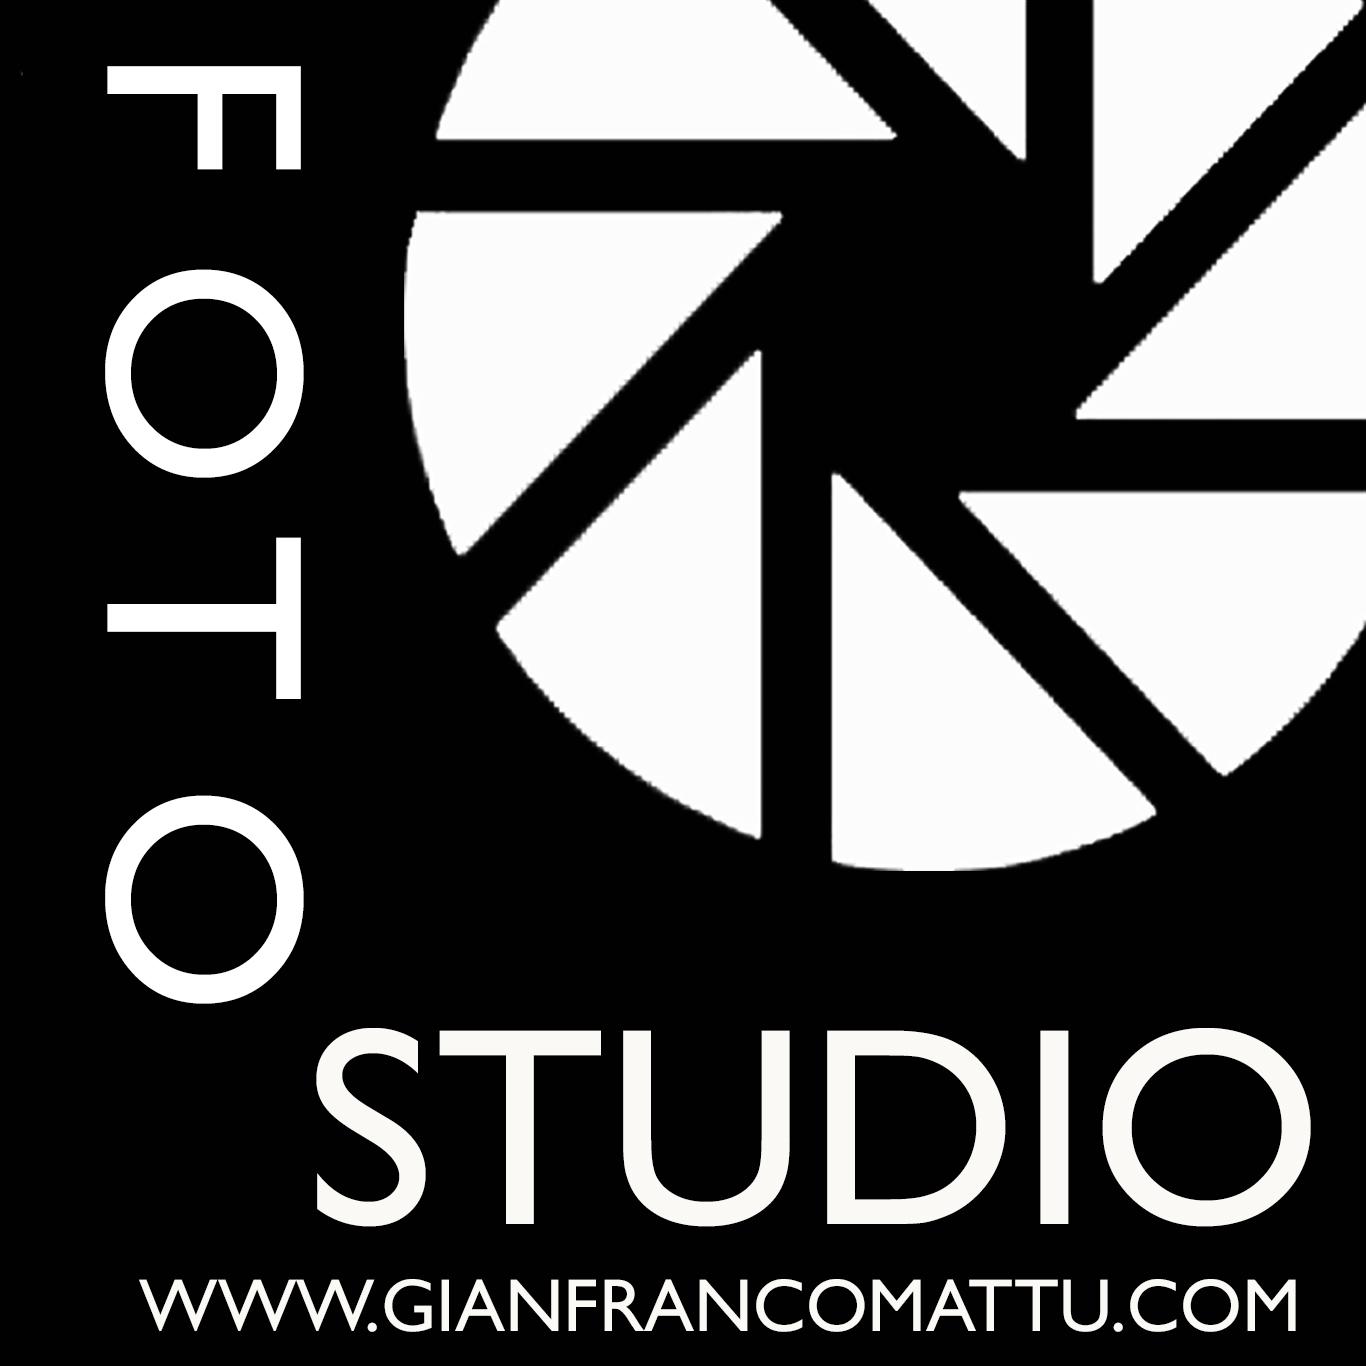 ichnusaorg_63logo-studio-2.jpg